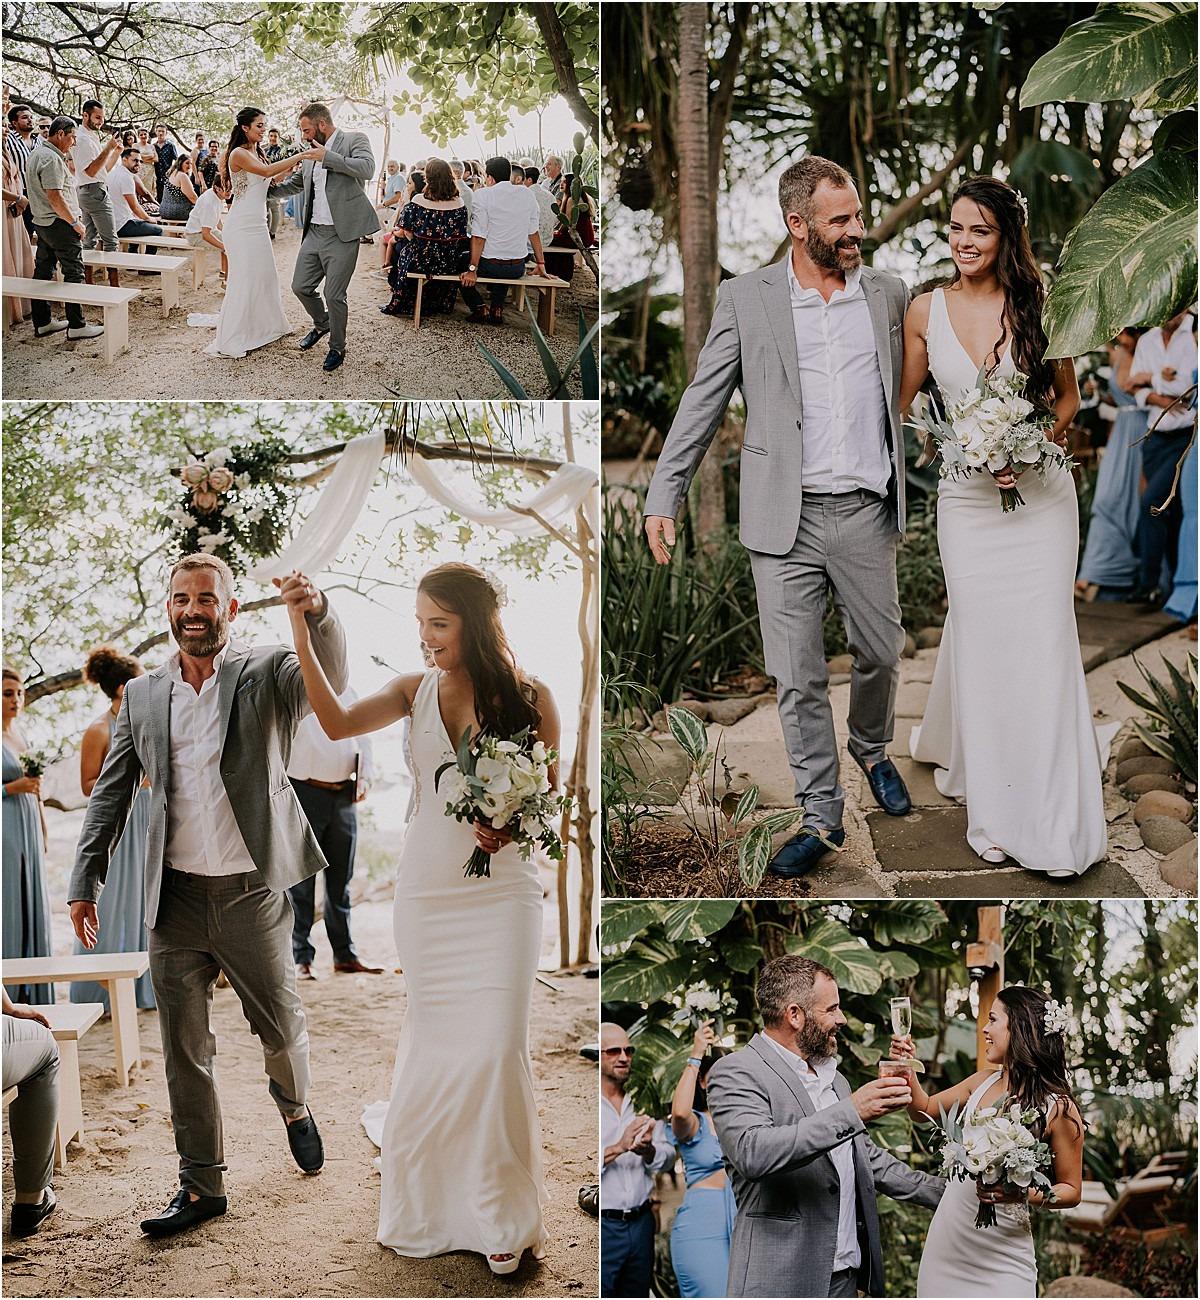 after the big i do wedding dance